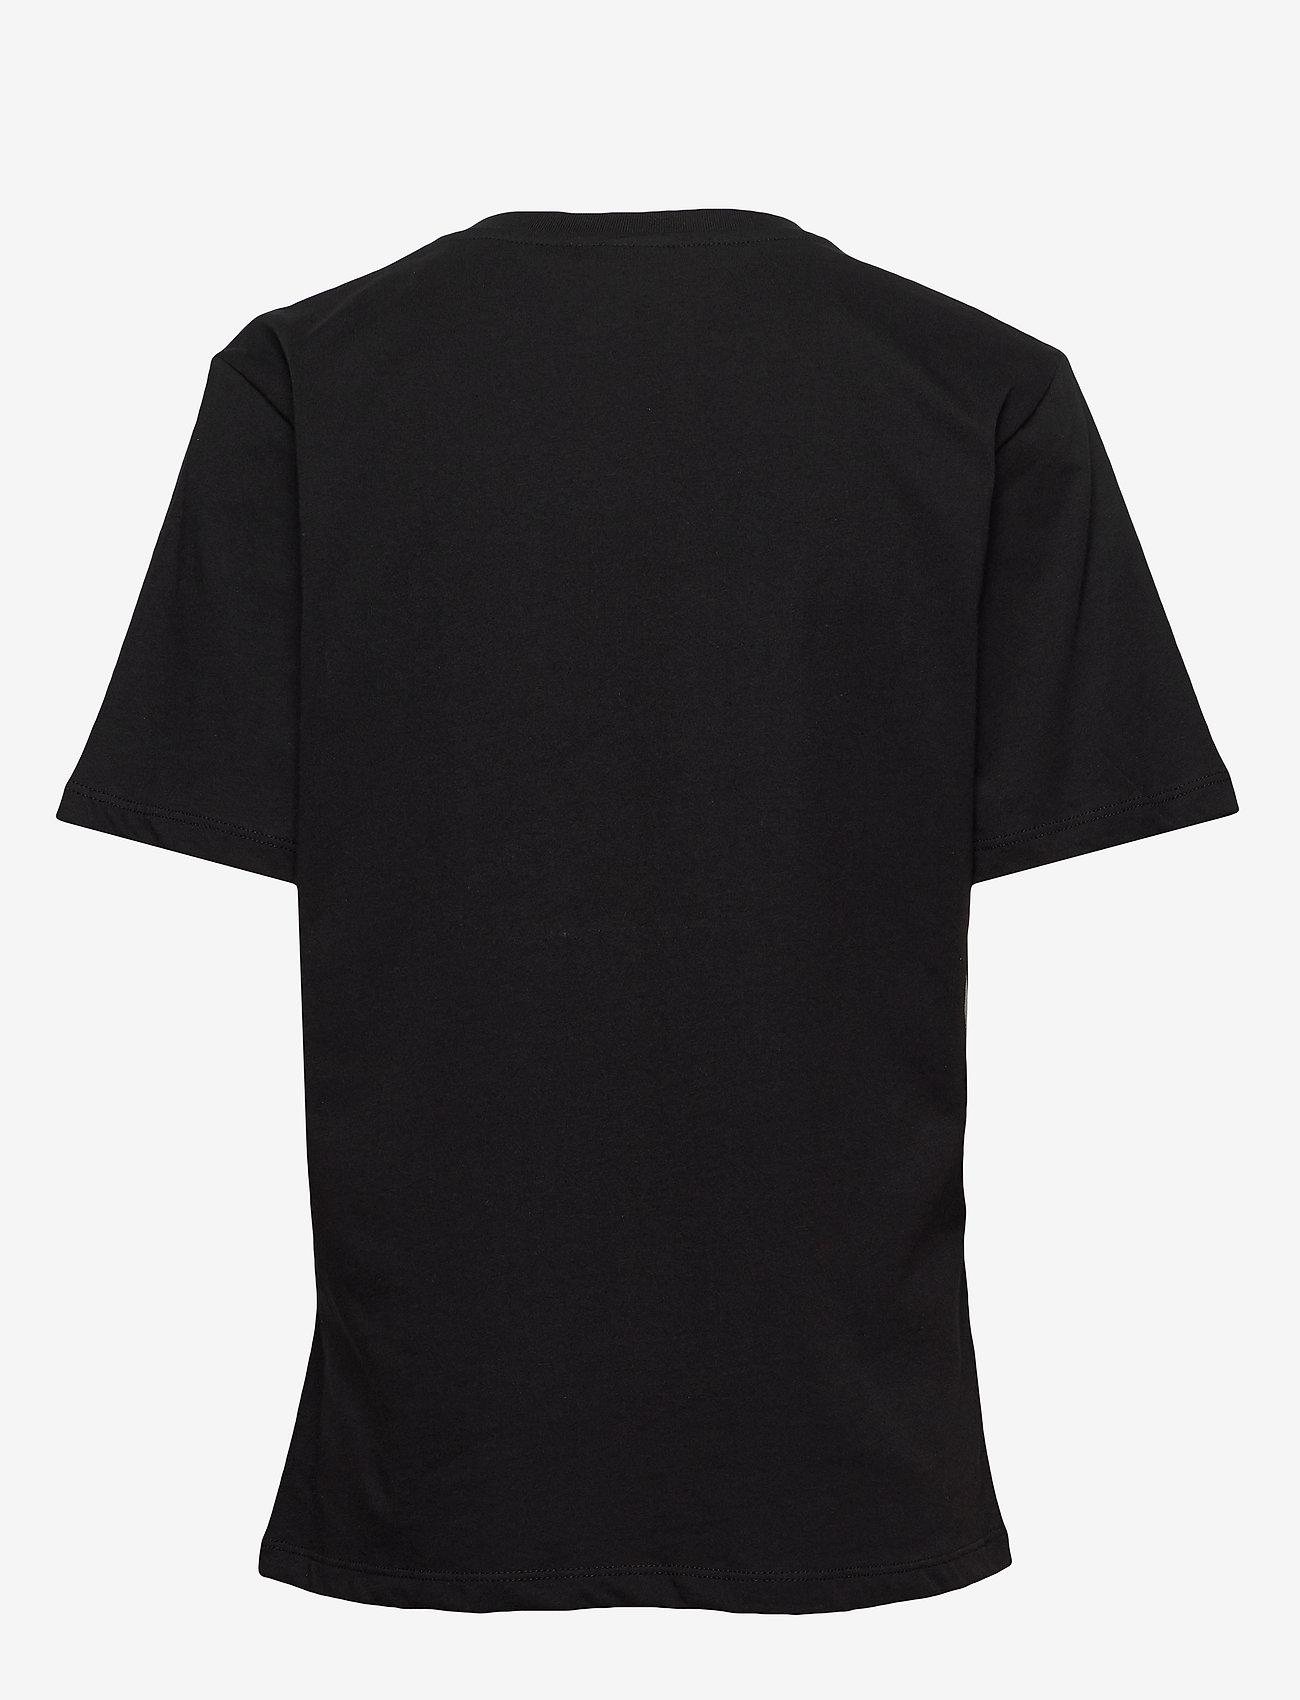 Gestuz - LivGZ tee NOOS - t-shirts - black - 1